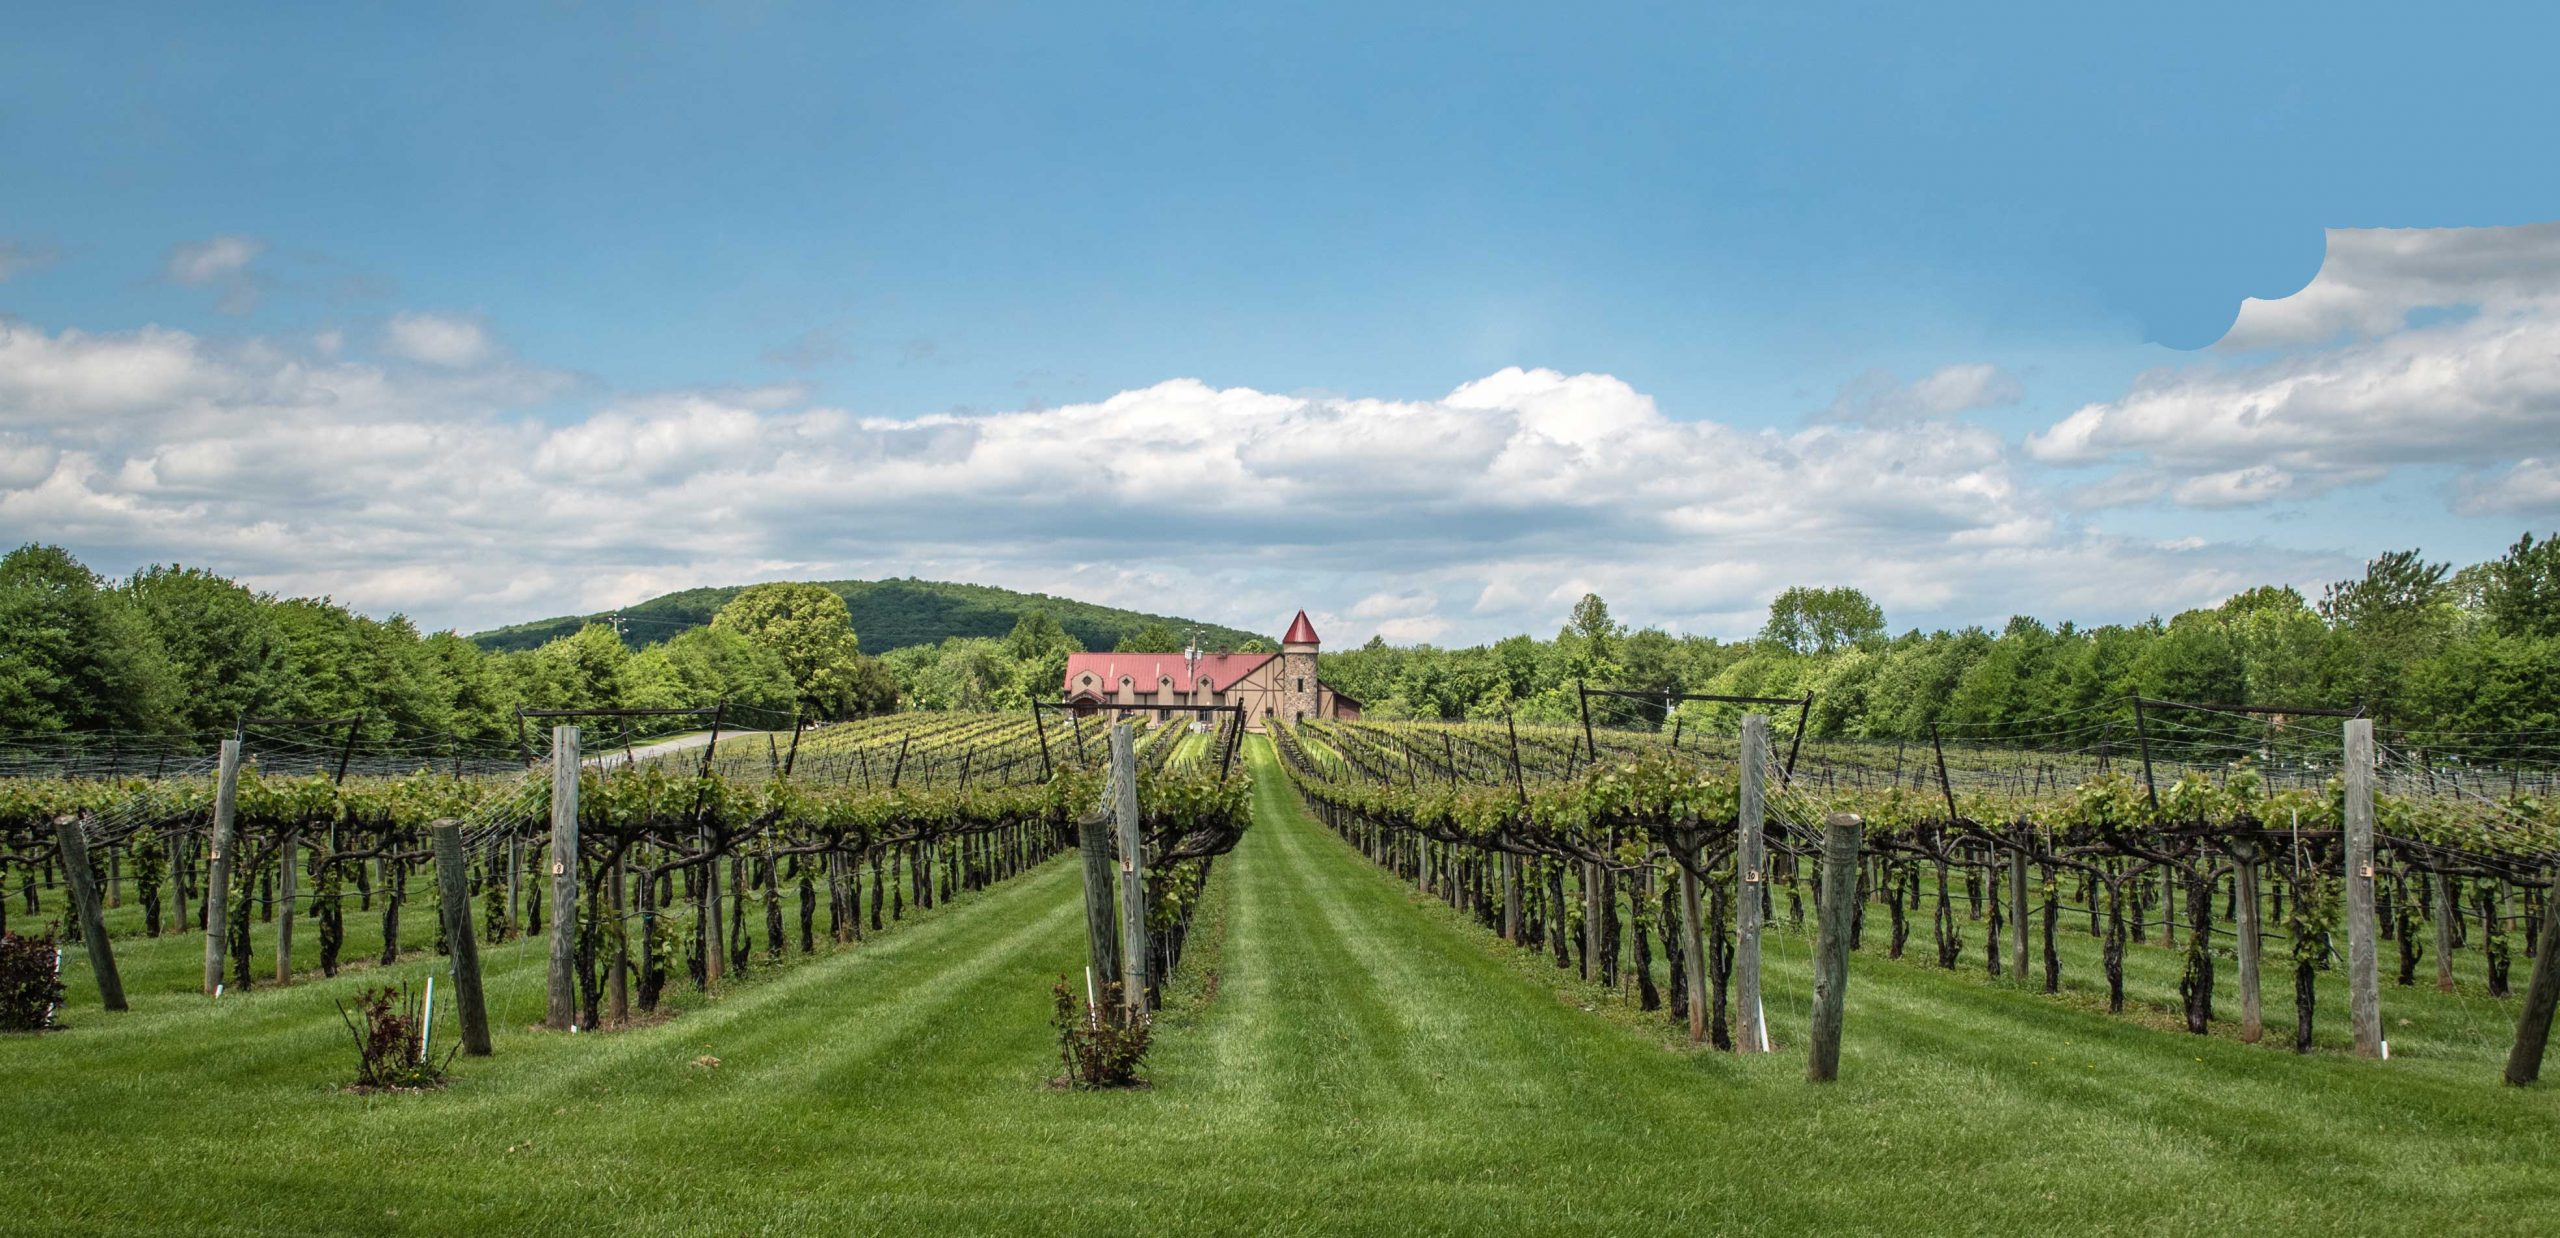 Horton Vineyards